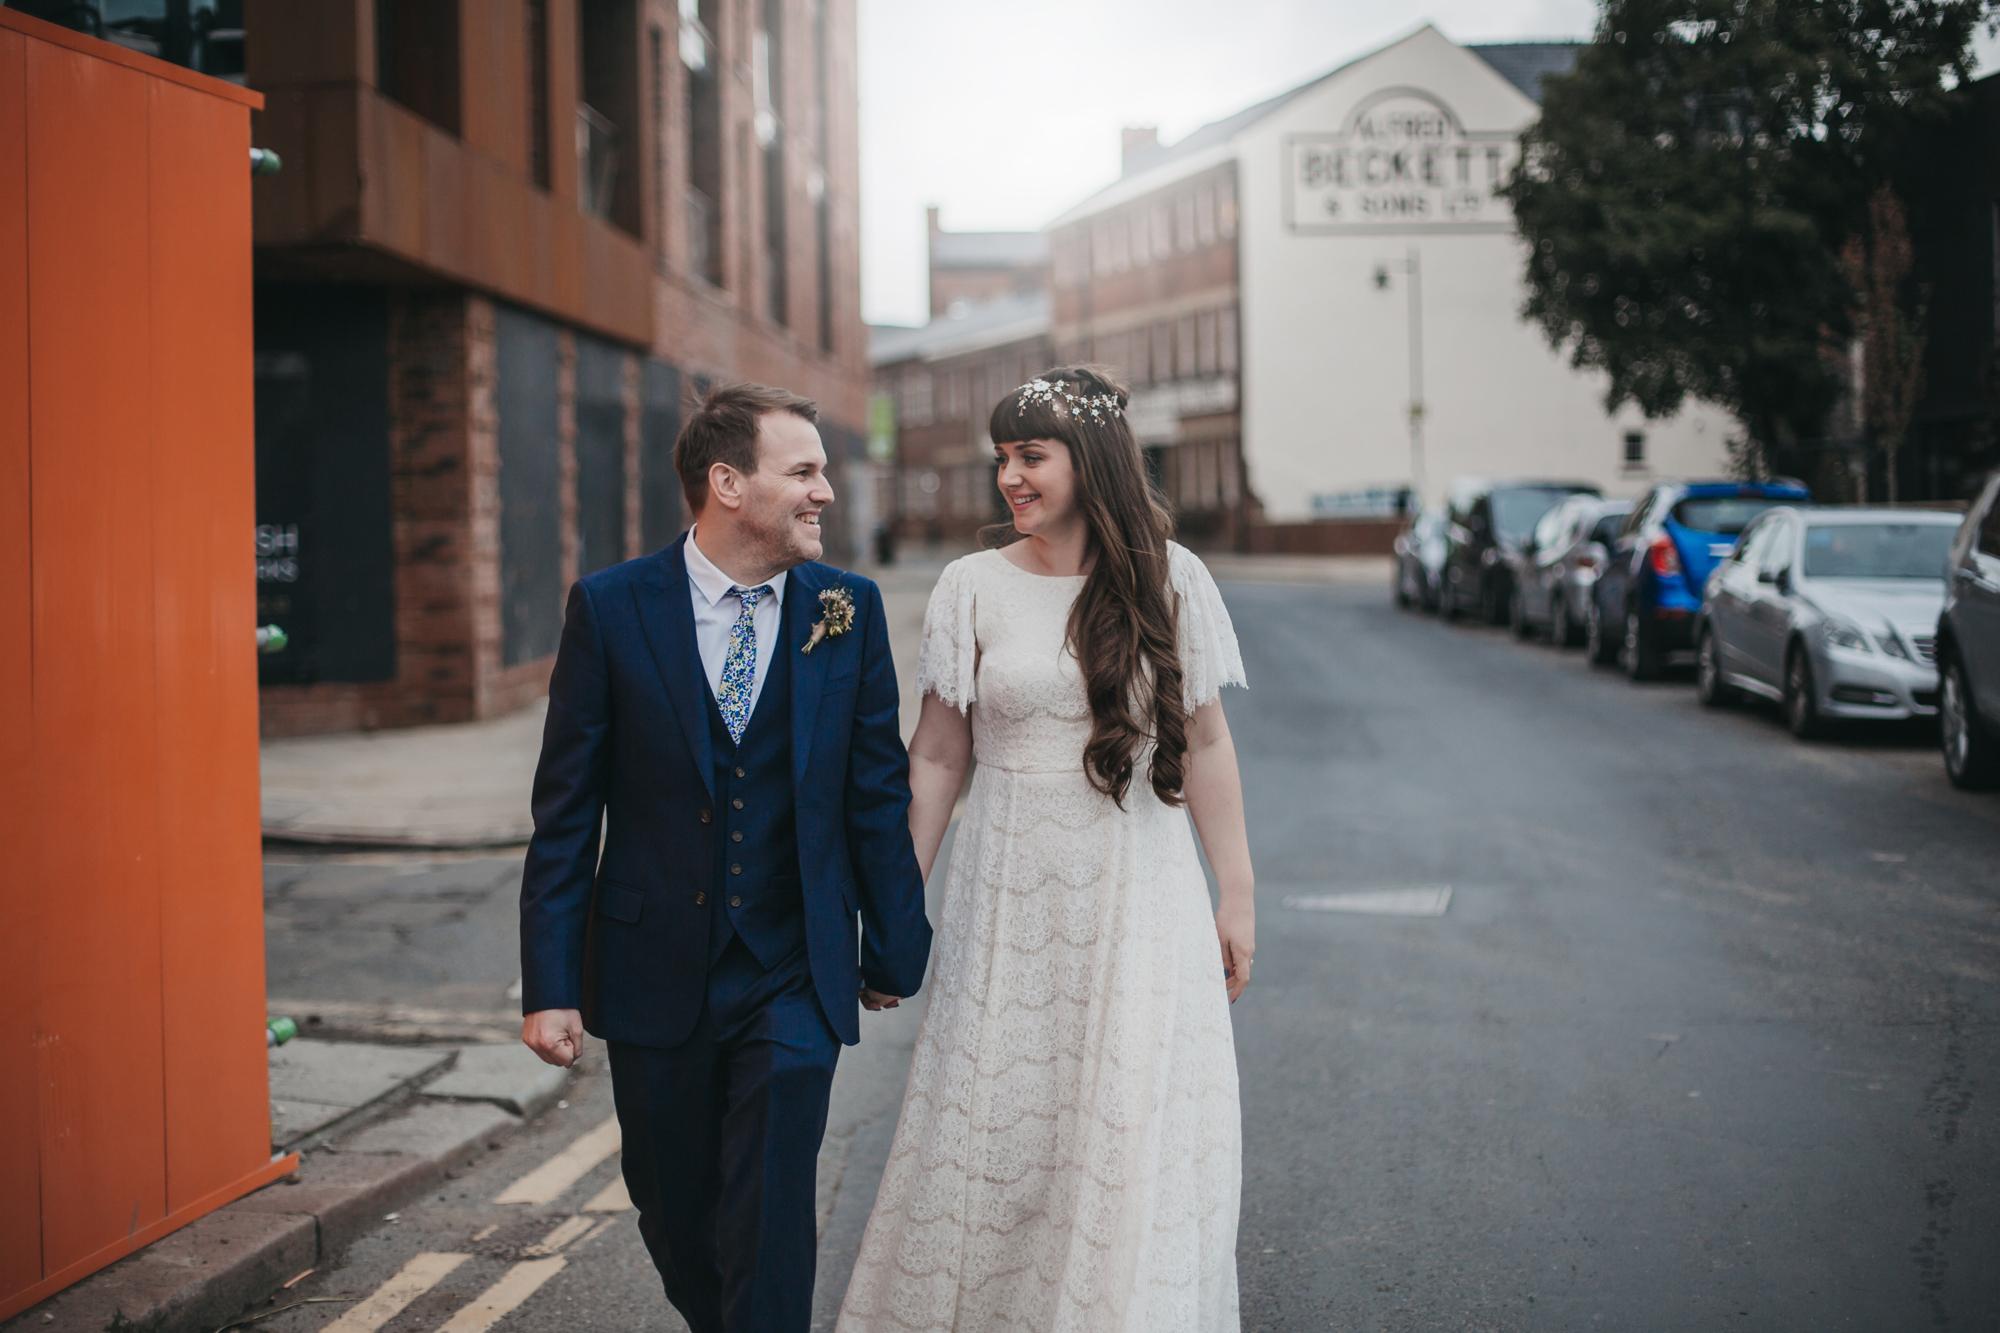 Kristy-Back-Garden-Outdoor-Wedding-Sheffield-Industrial-Warehouse-Wedding-Bohemian-Kate-Beaumont-Dahlia-Dress-43.jpg